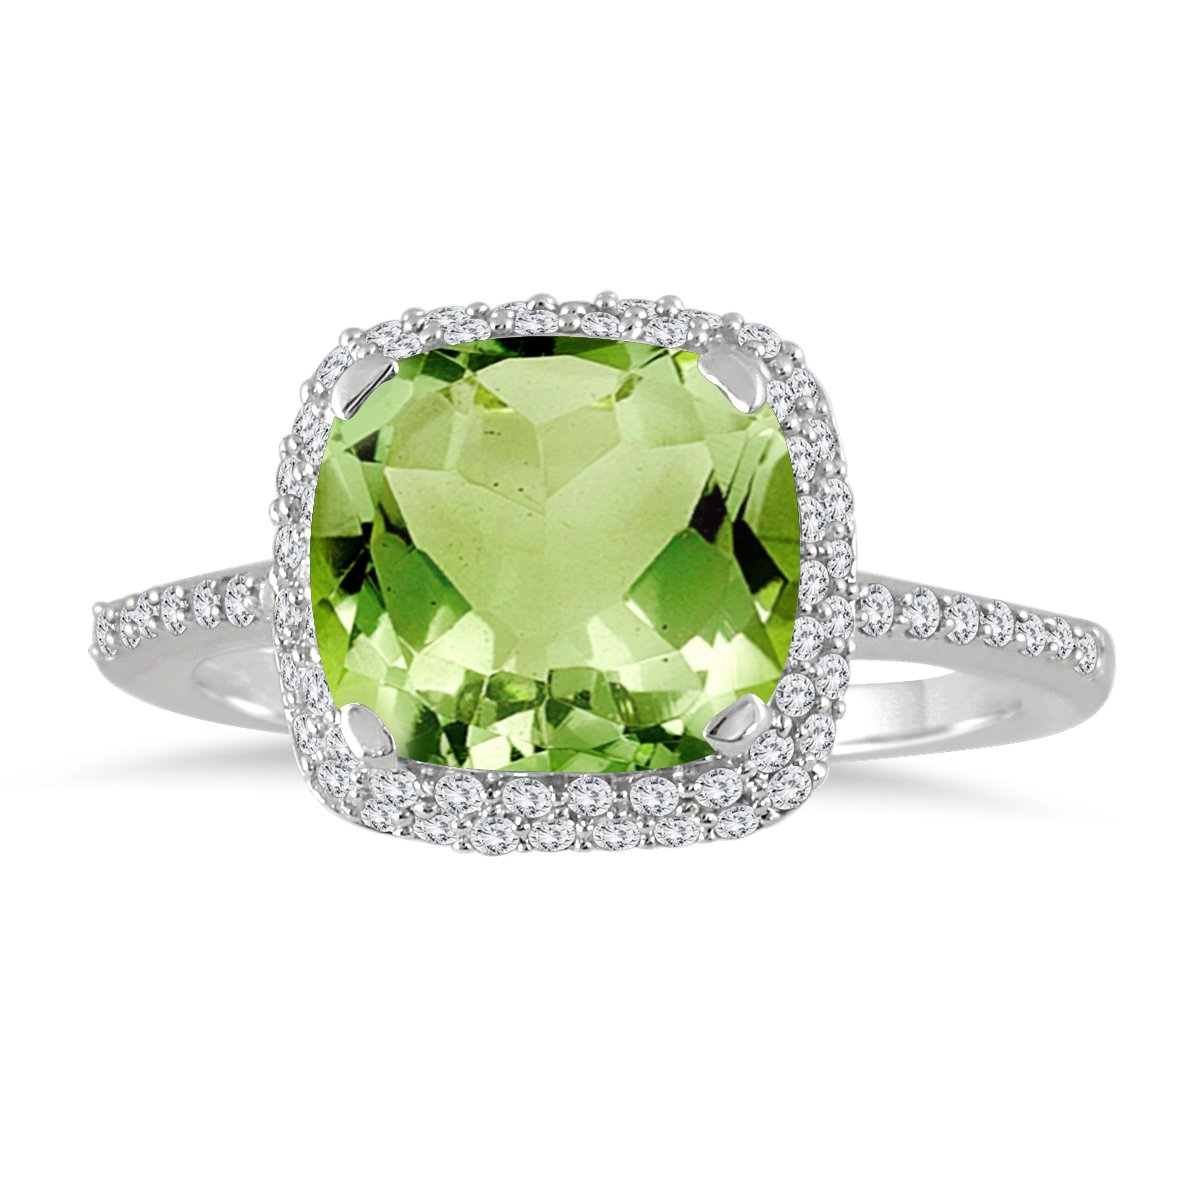 Cushion Cut Peridot and Diamond Halo Ring in 10K White Gold by Szul